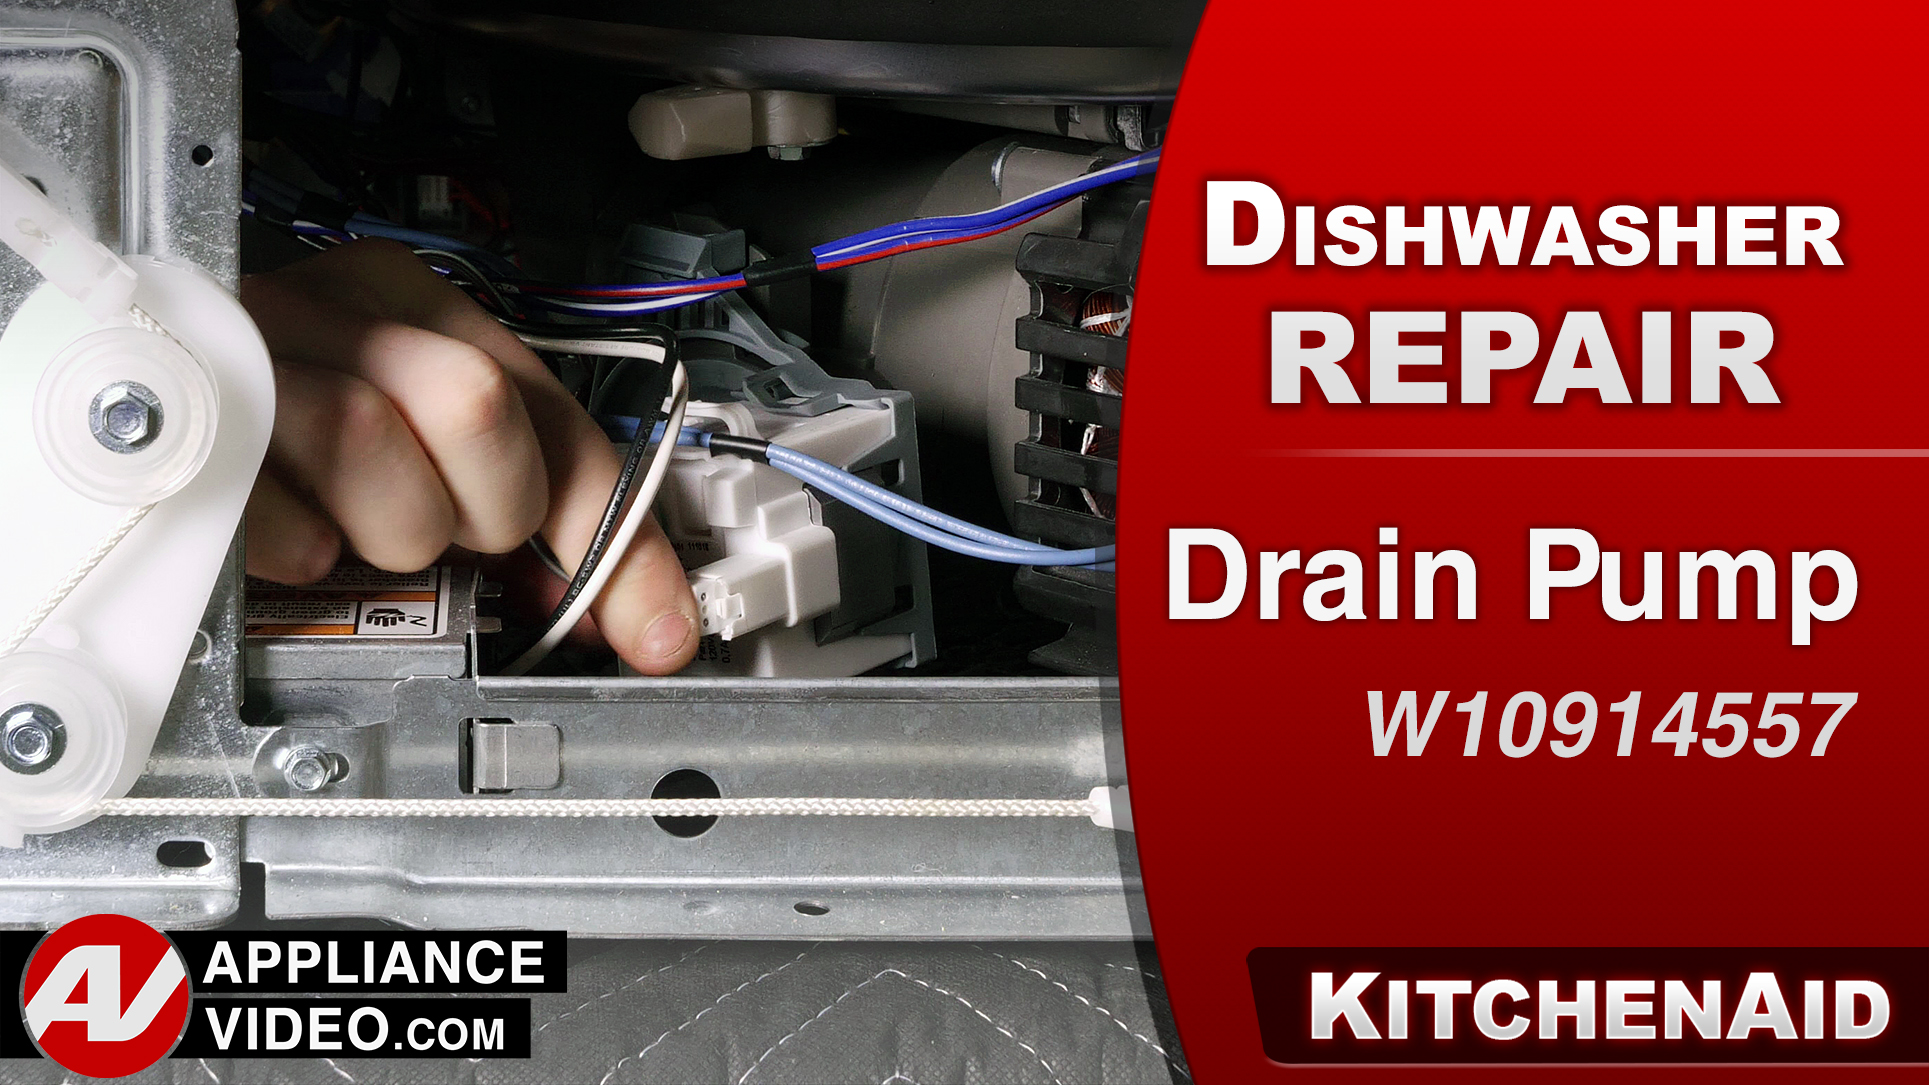 KitchenAid KDTM354ESS Dishwasher | Appliance Video